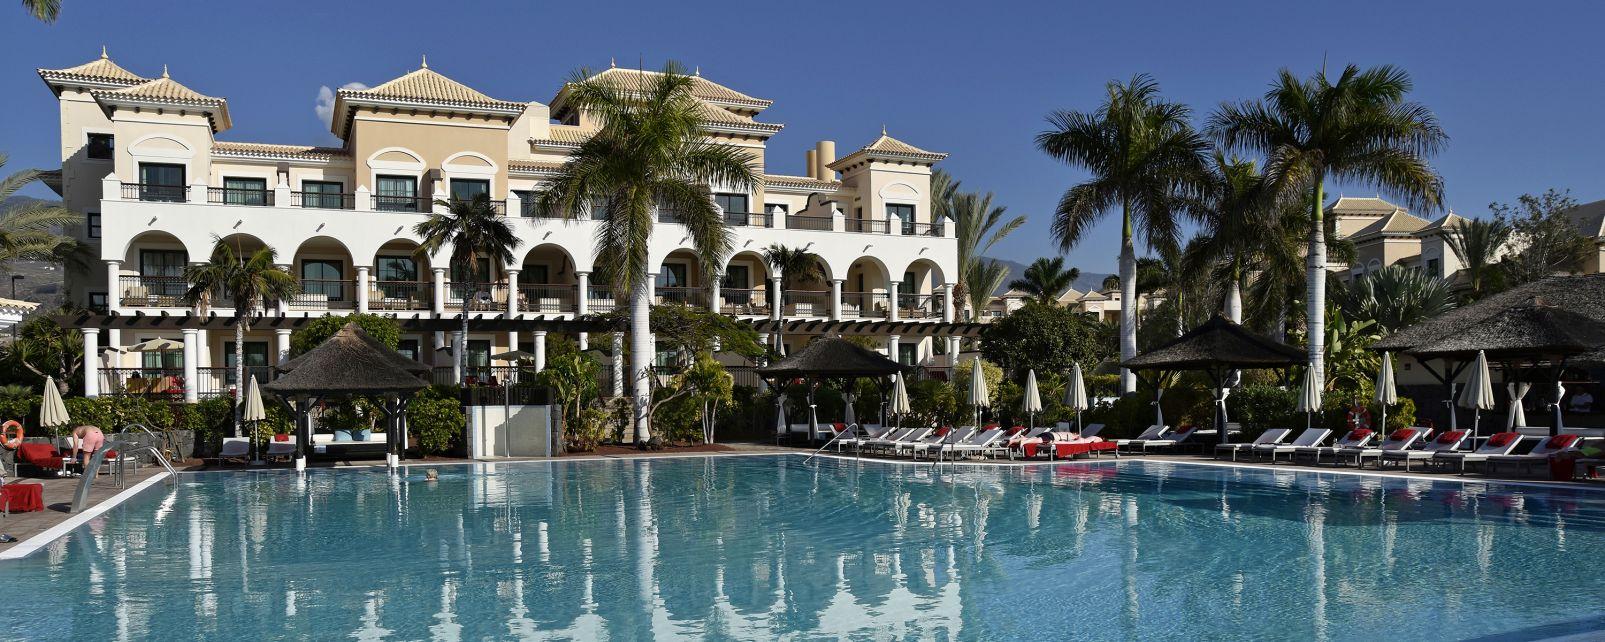 TUI Sensatori Resort Tenerife